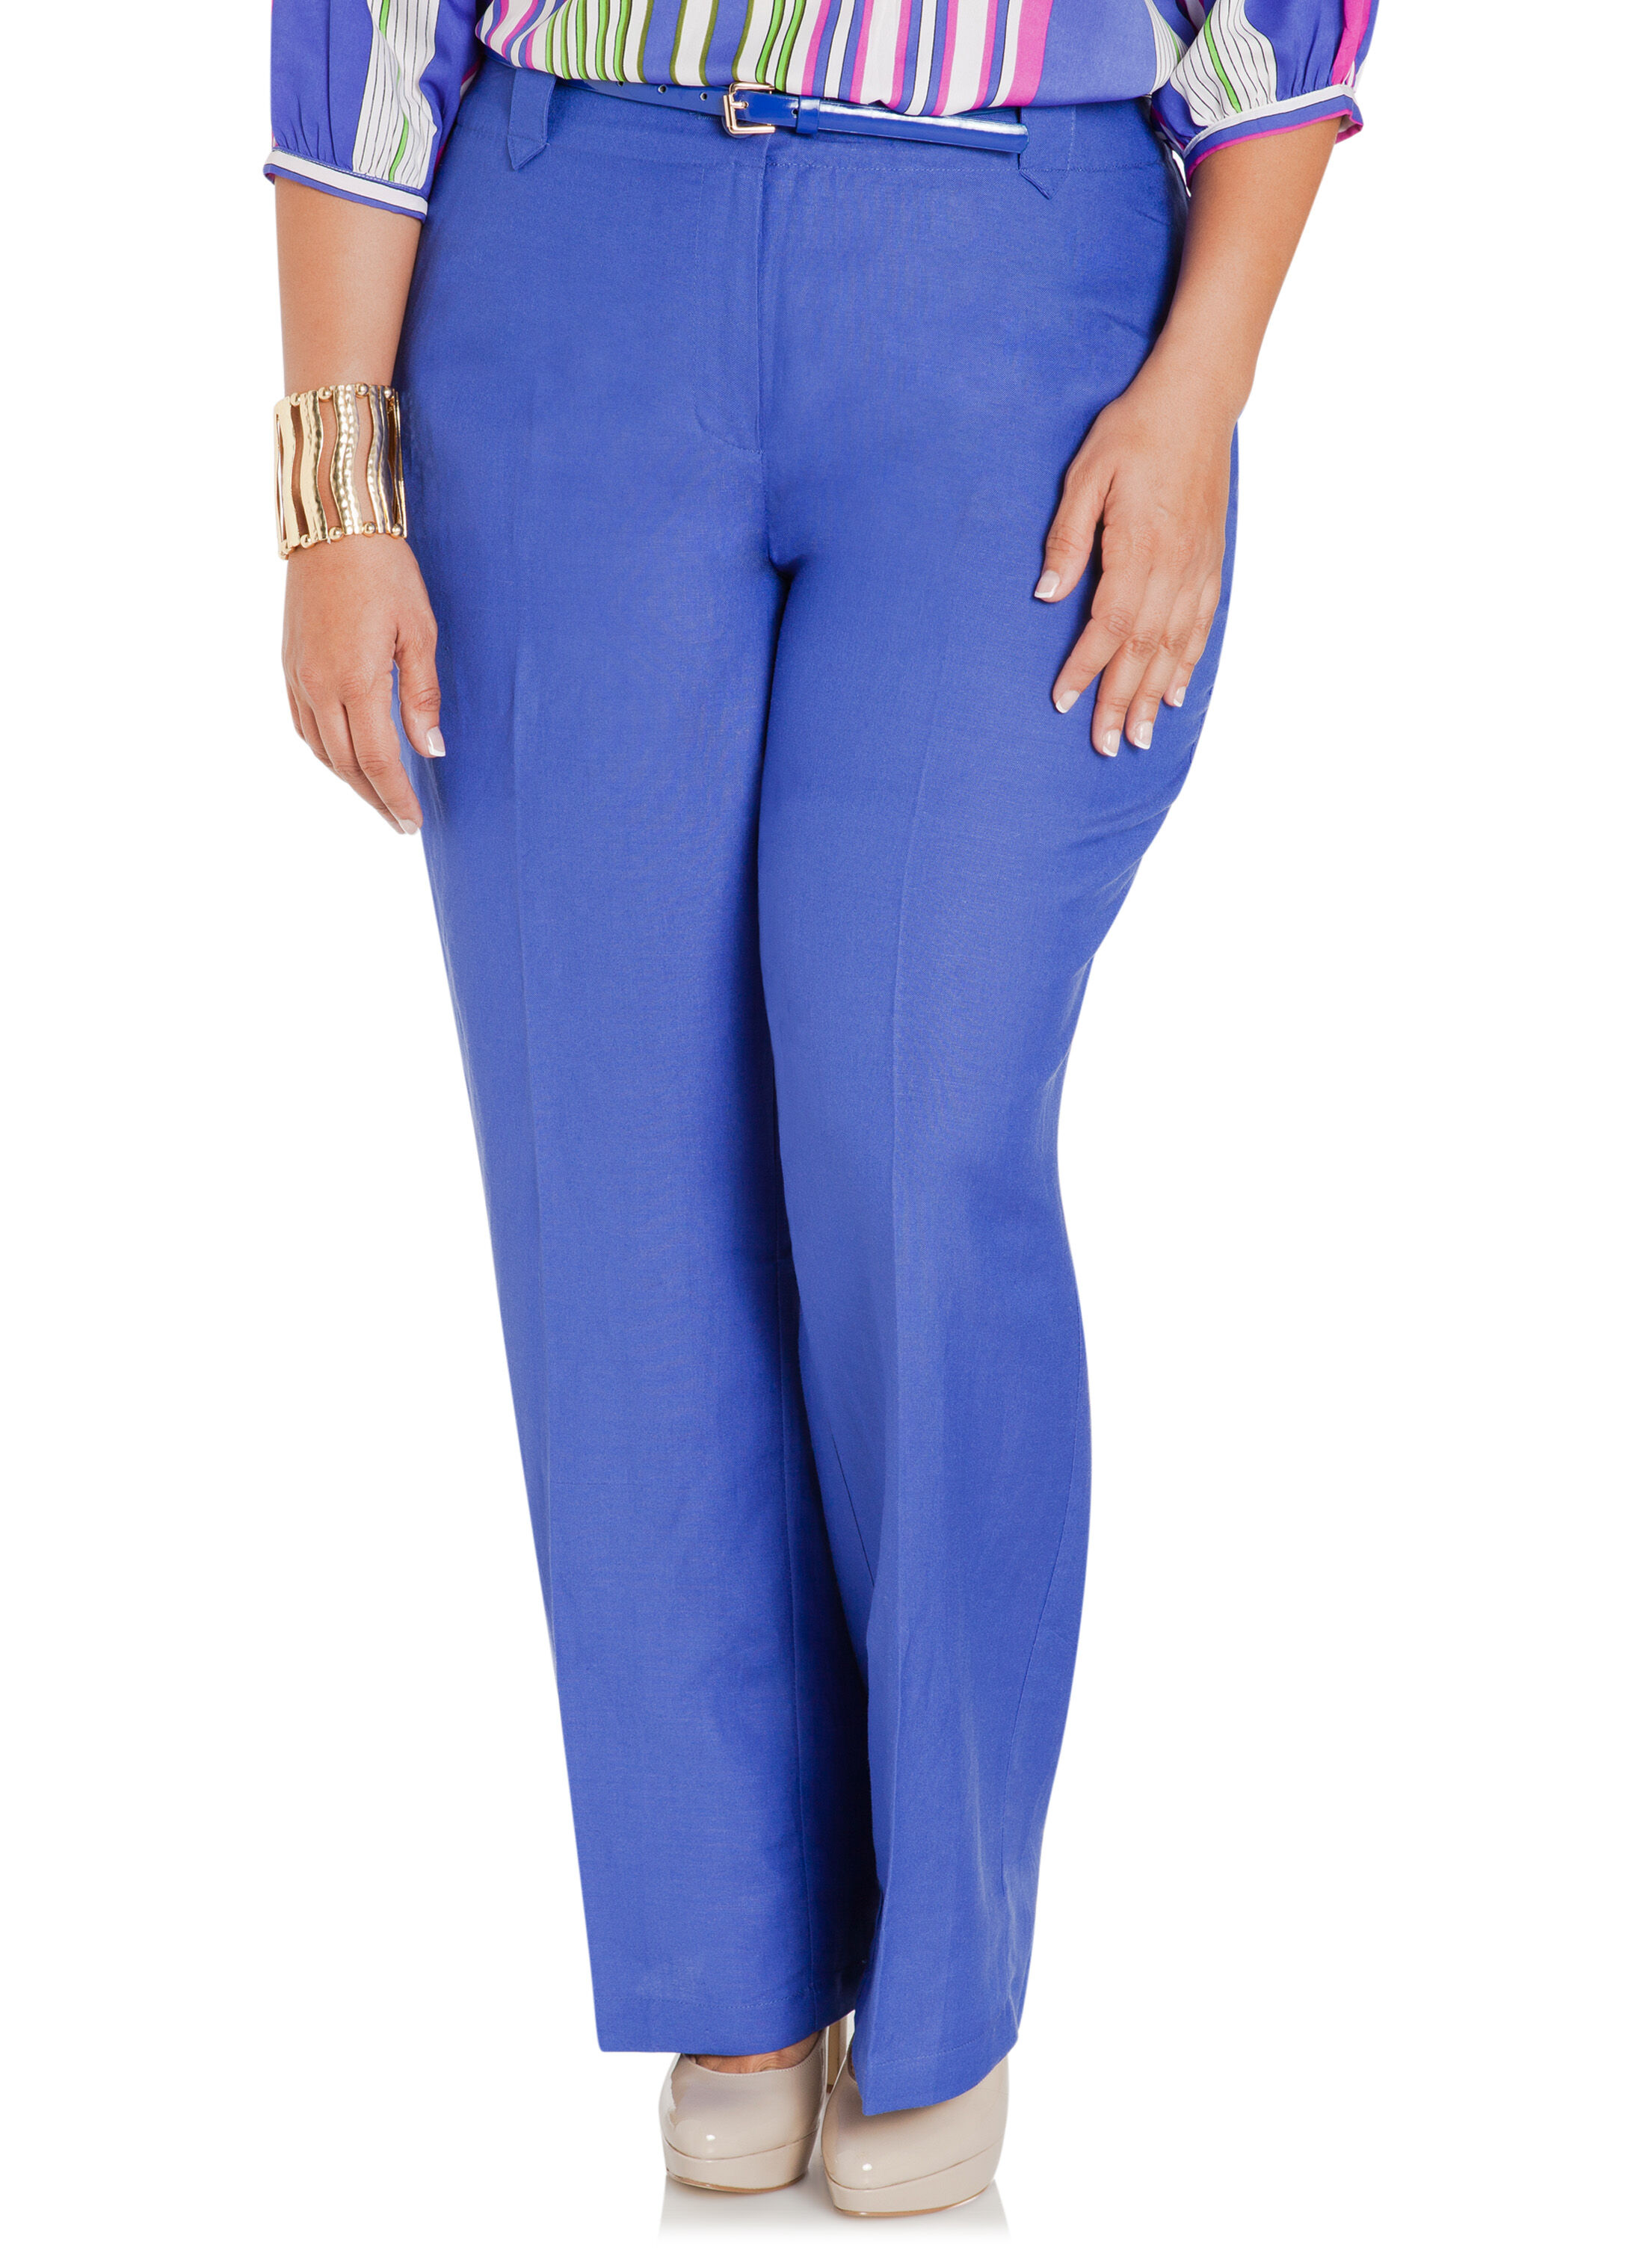 Belted Linen Pants